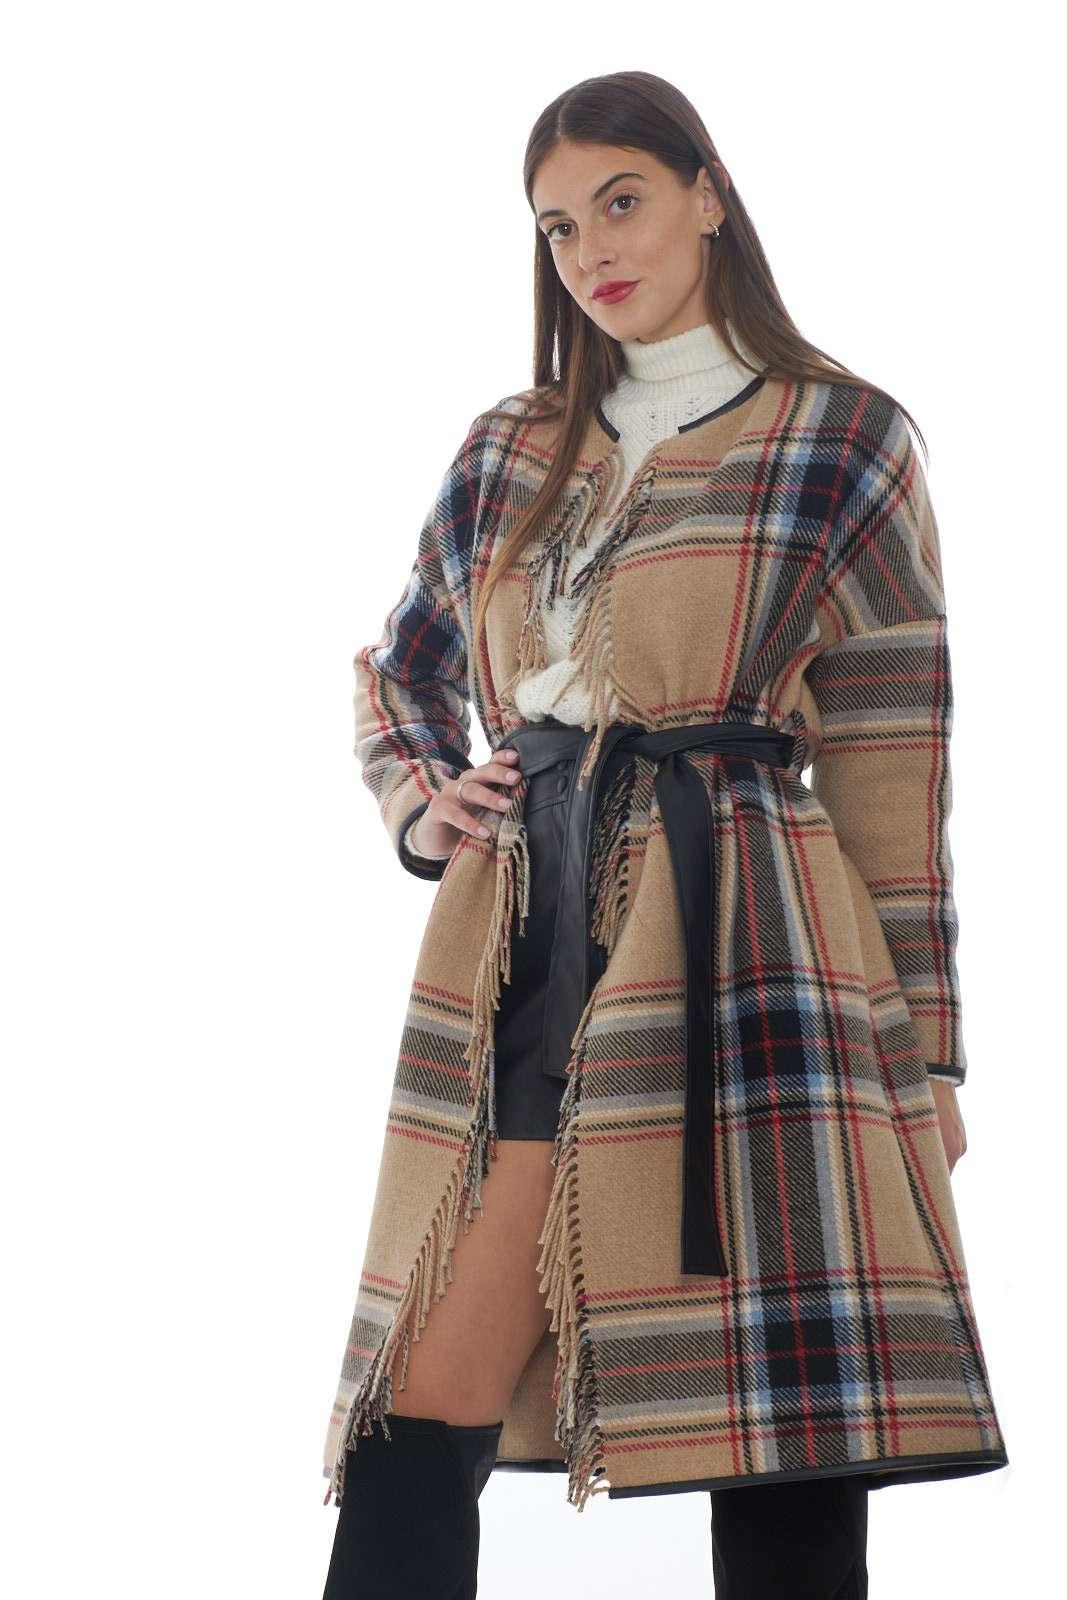 https://www.parmax.com/media/catalog/product/a/i/AI-outlet_parmax-cappotto-donna.Pinko-1G14HX-B.jpg